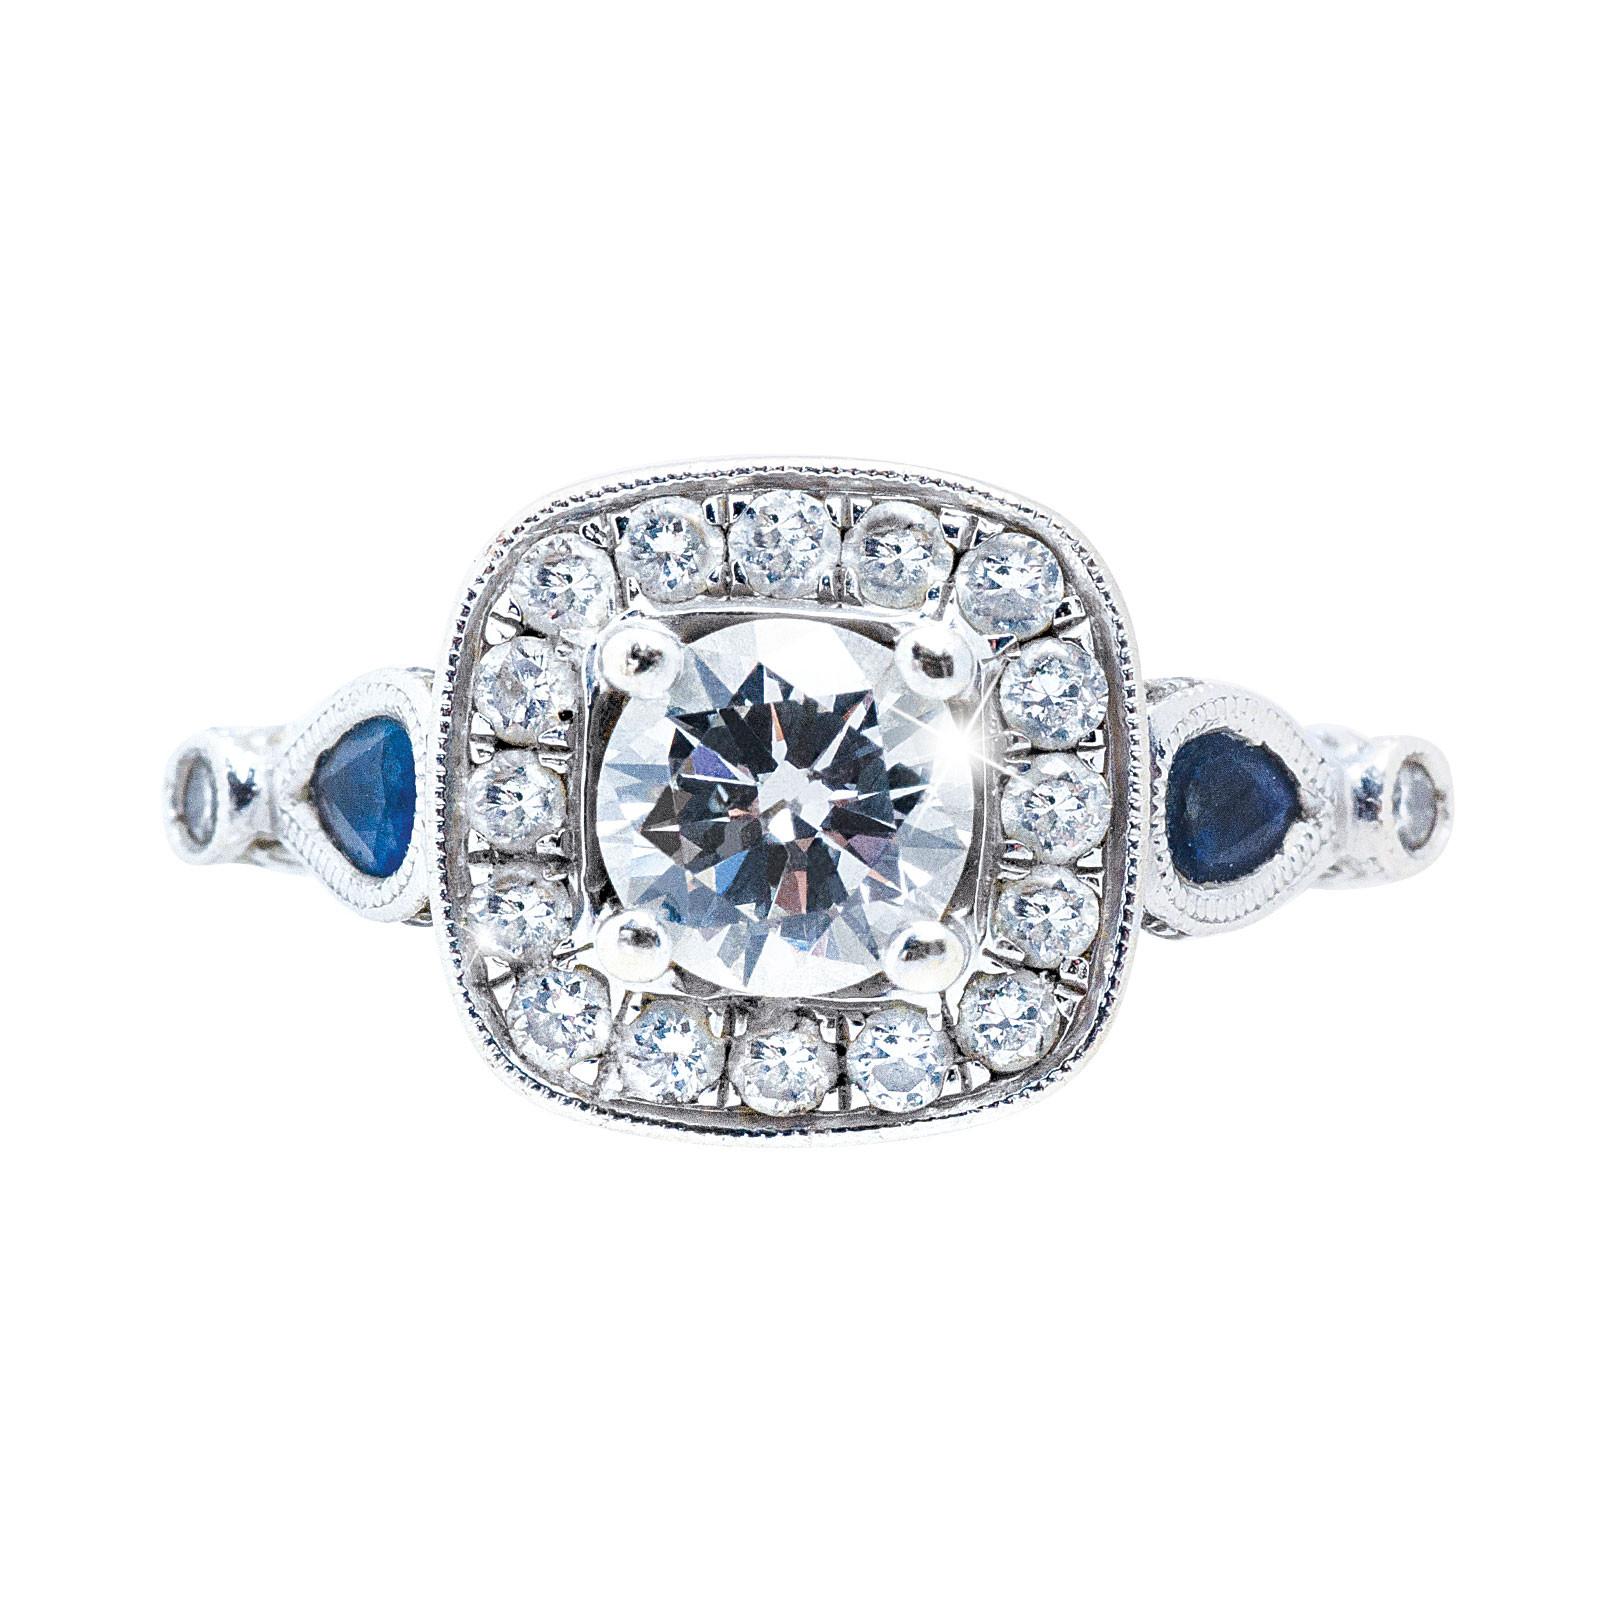 Vintage 1.42 CTW Diamond & Blue Sapphire Engagement Ring